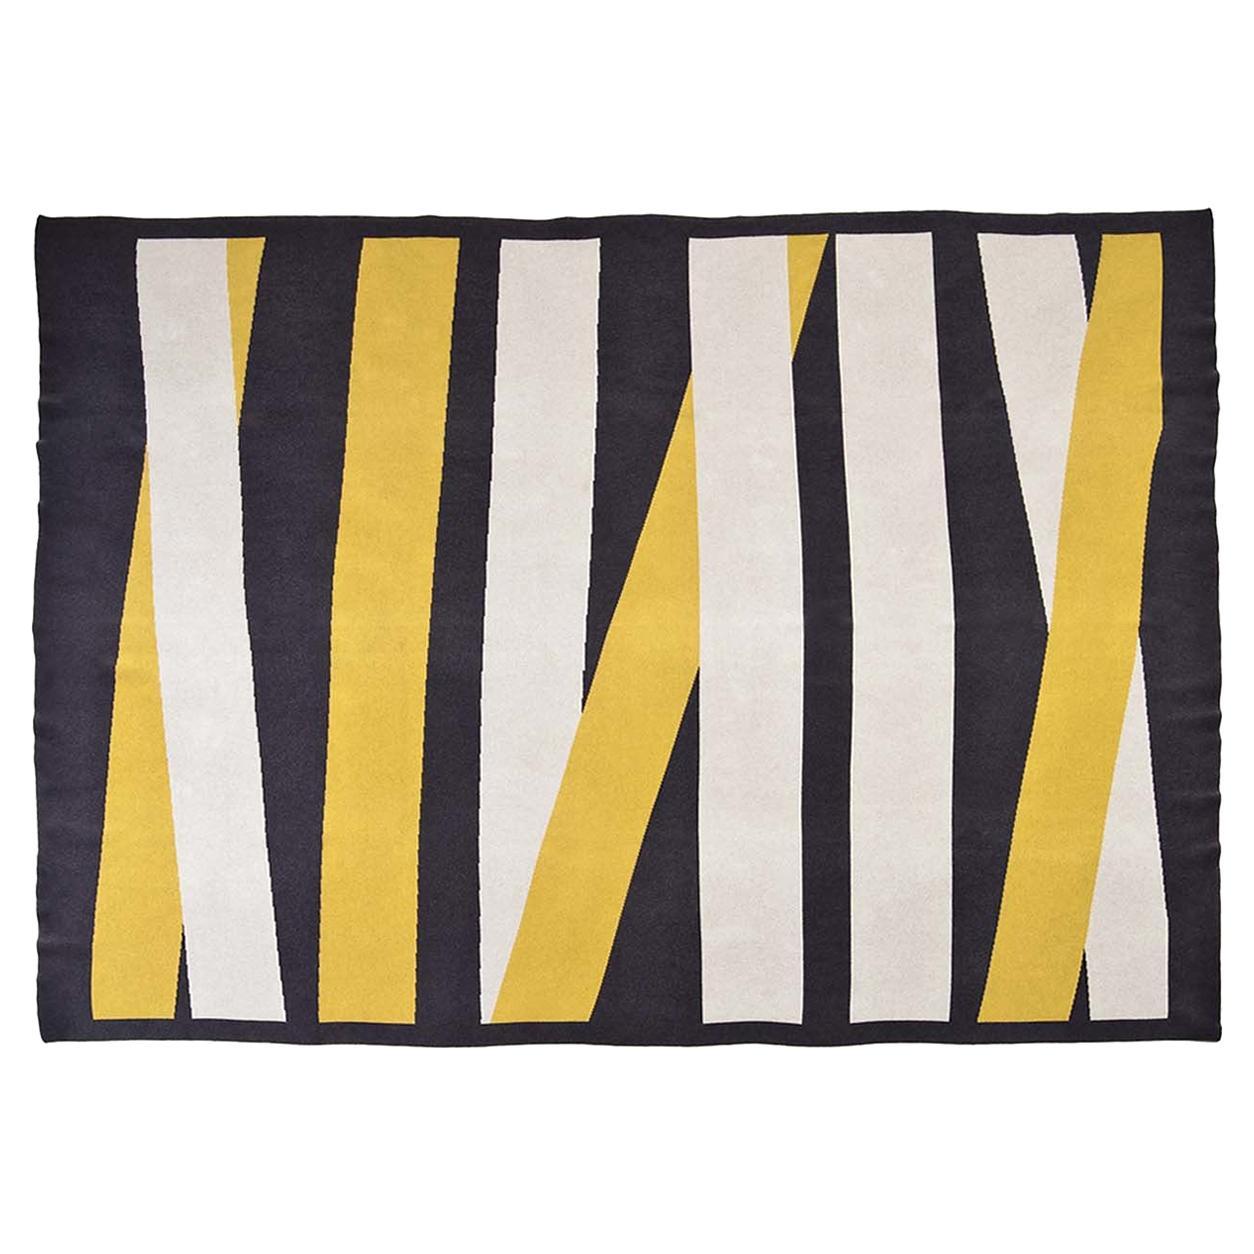 Sticks Blanket by Roberta Licini